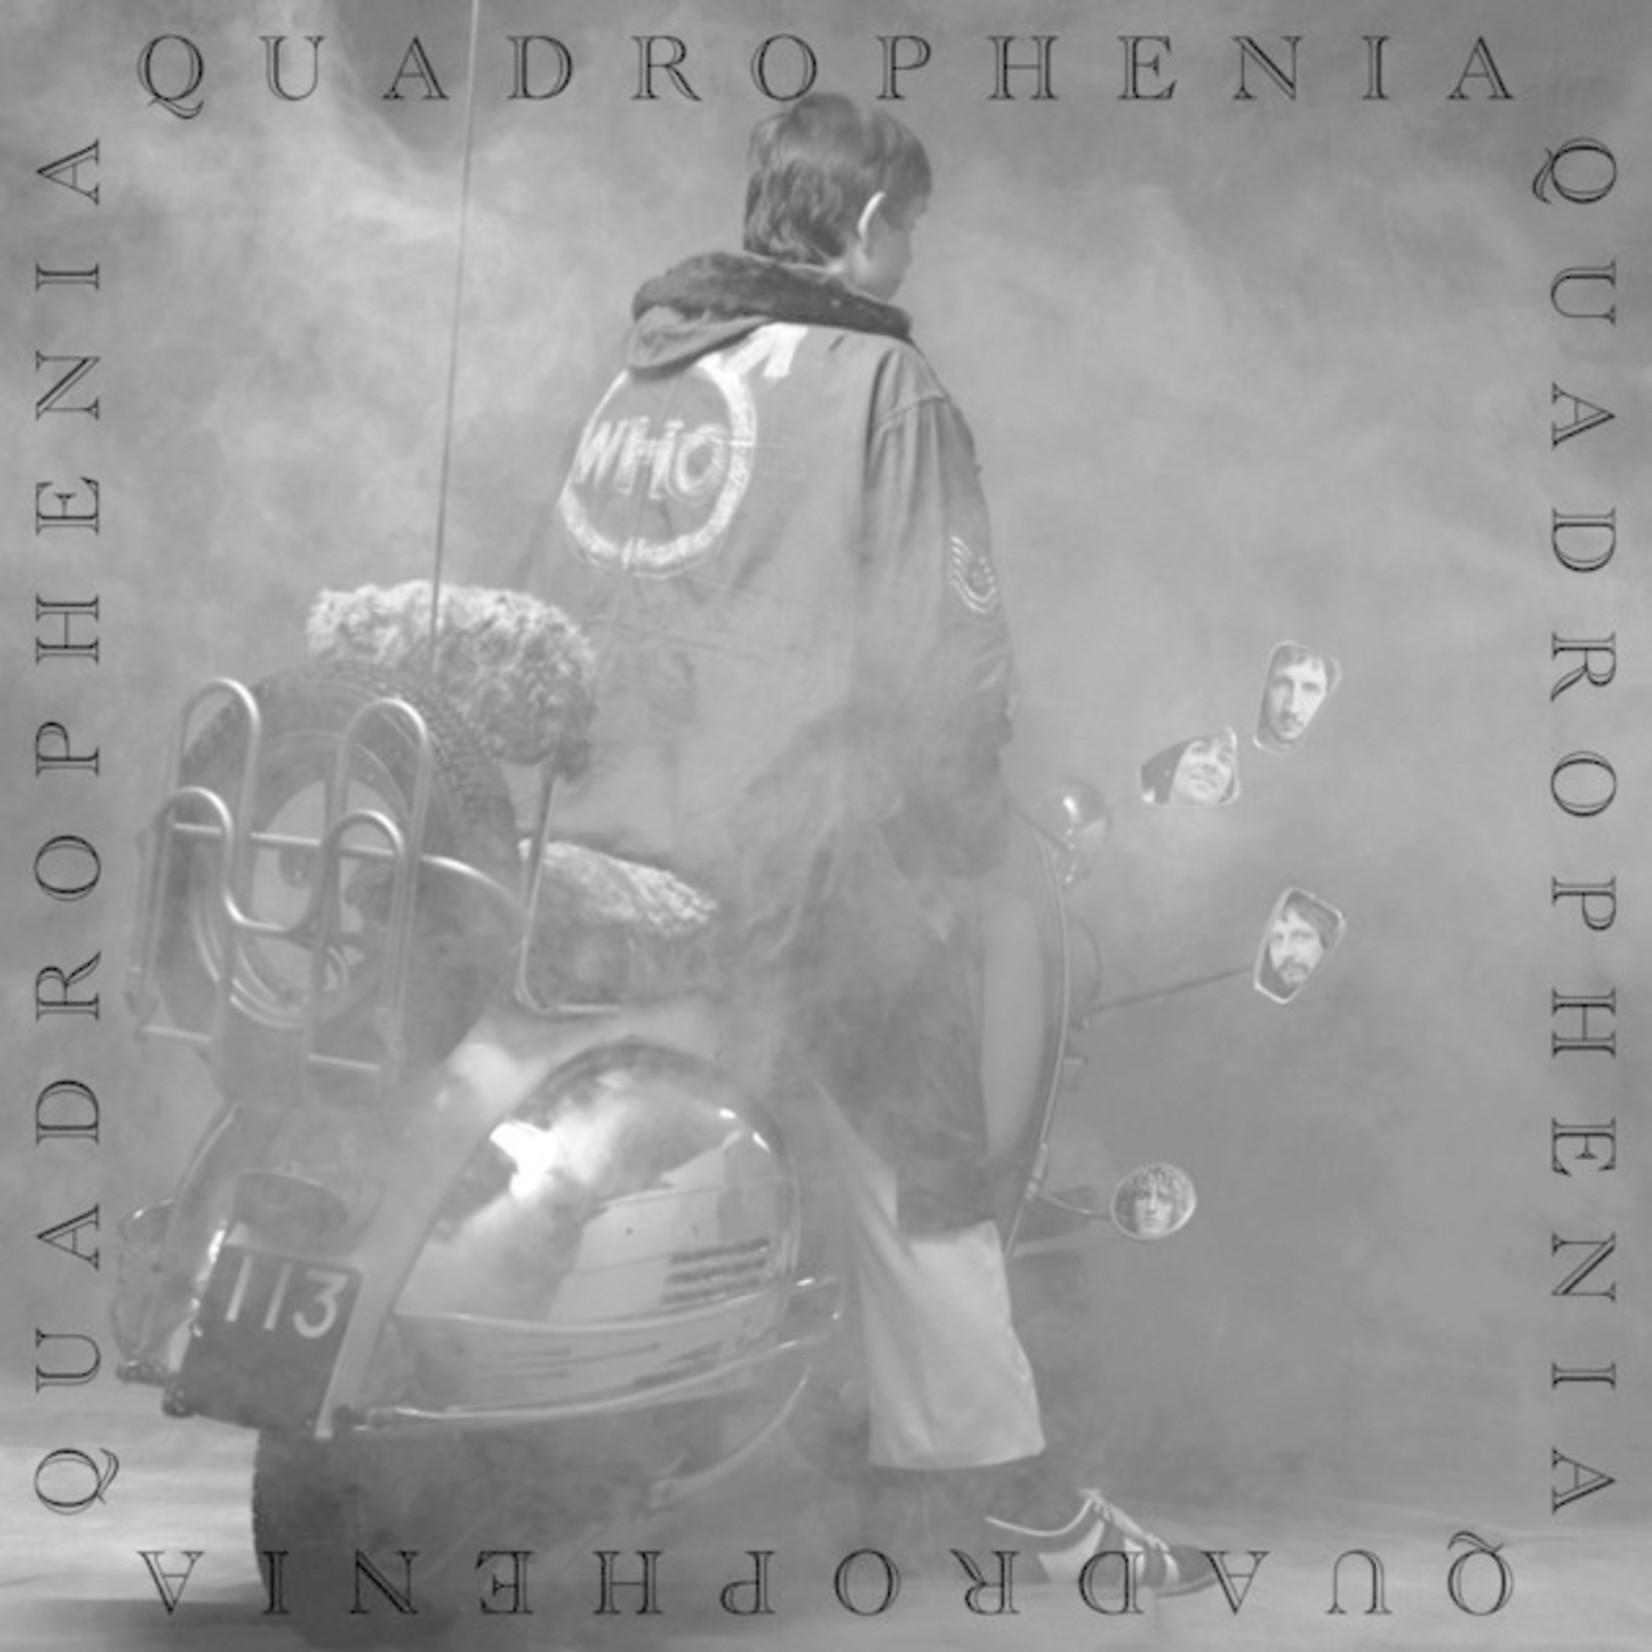 Vinyl The Who - Quadrophenia